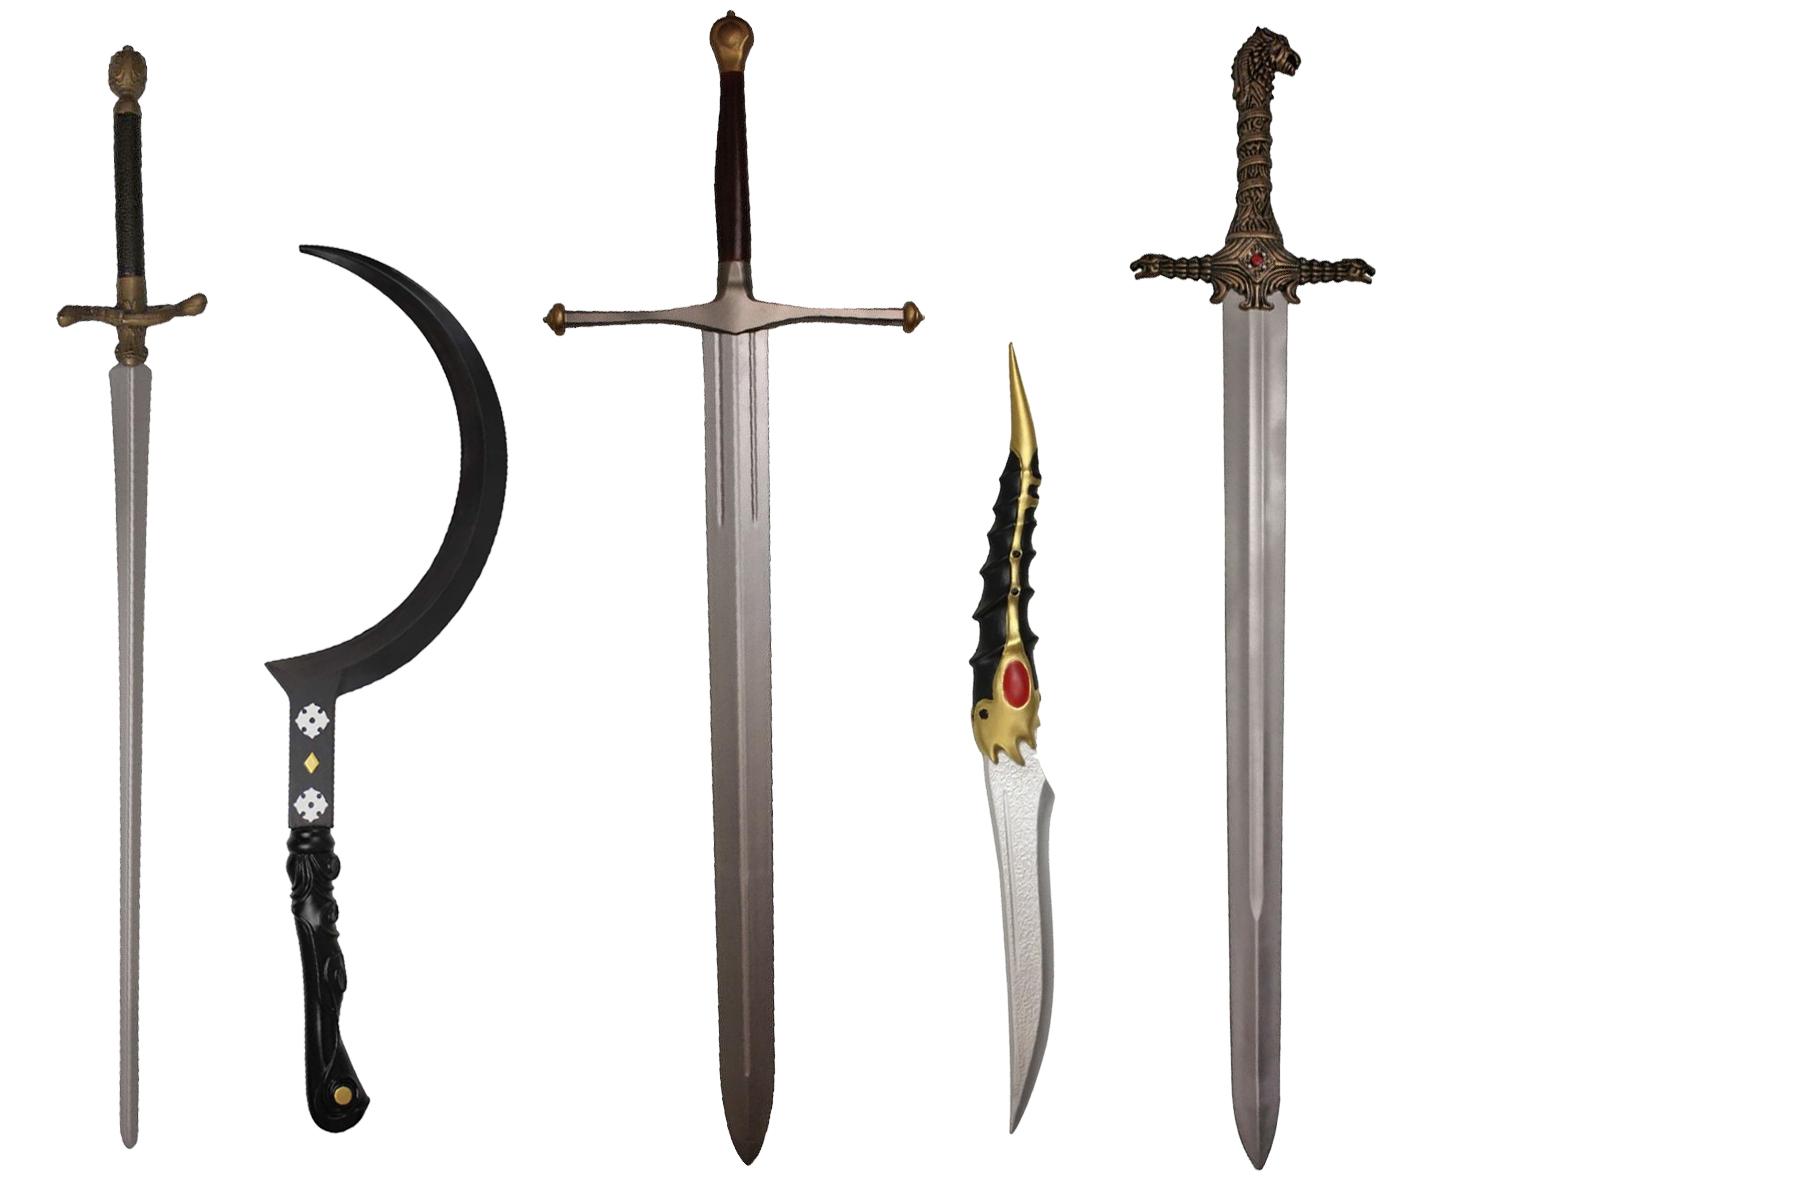 Réplica de Espadas de Juego de Tronos